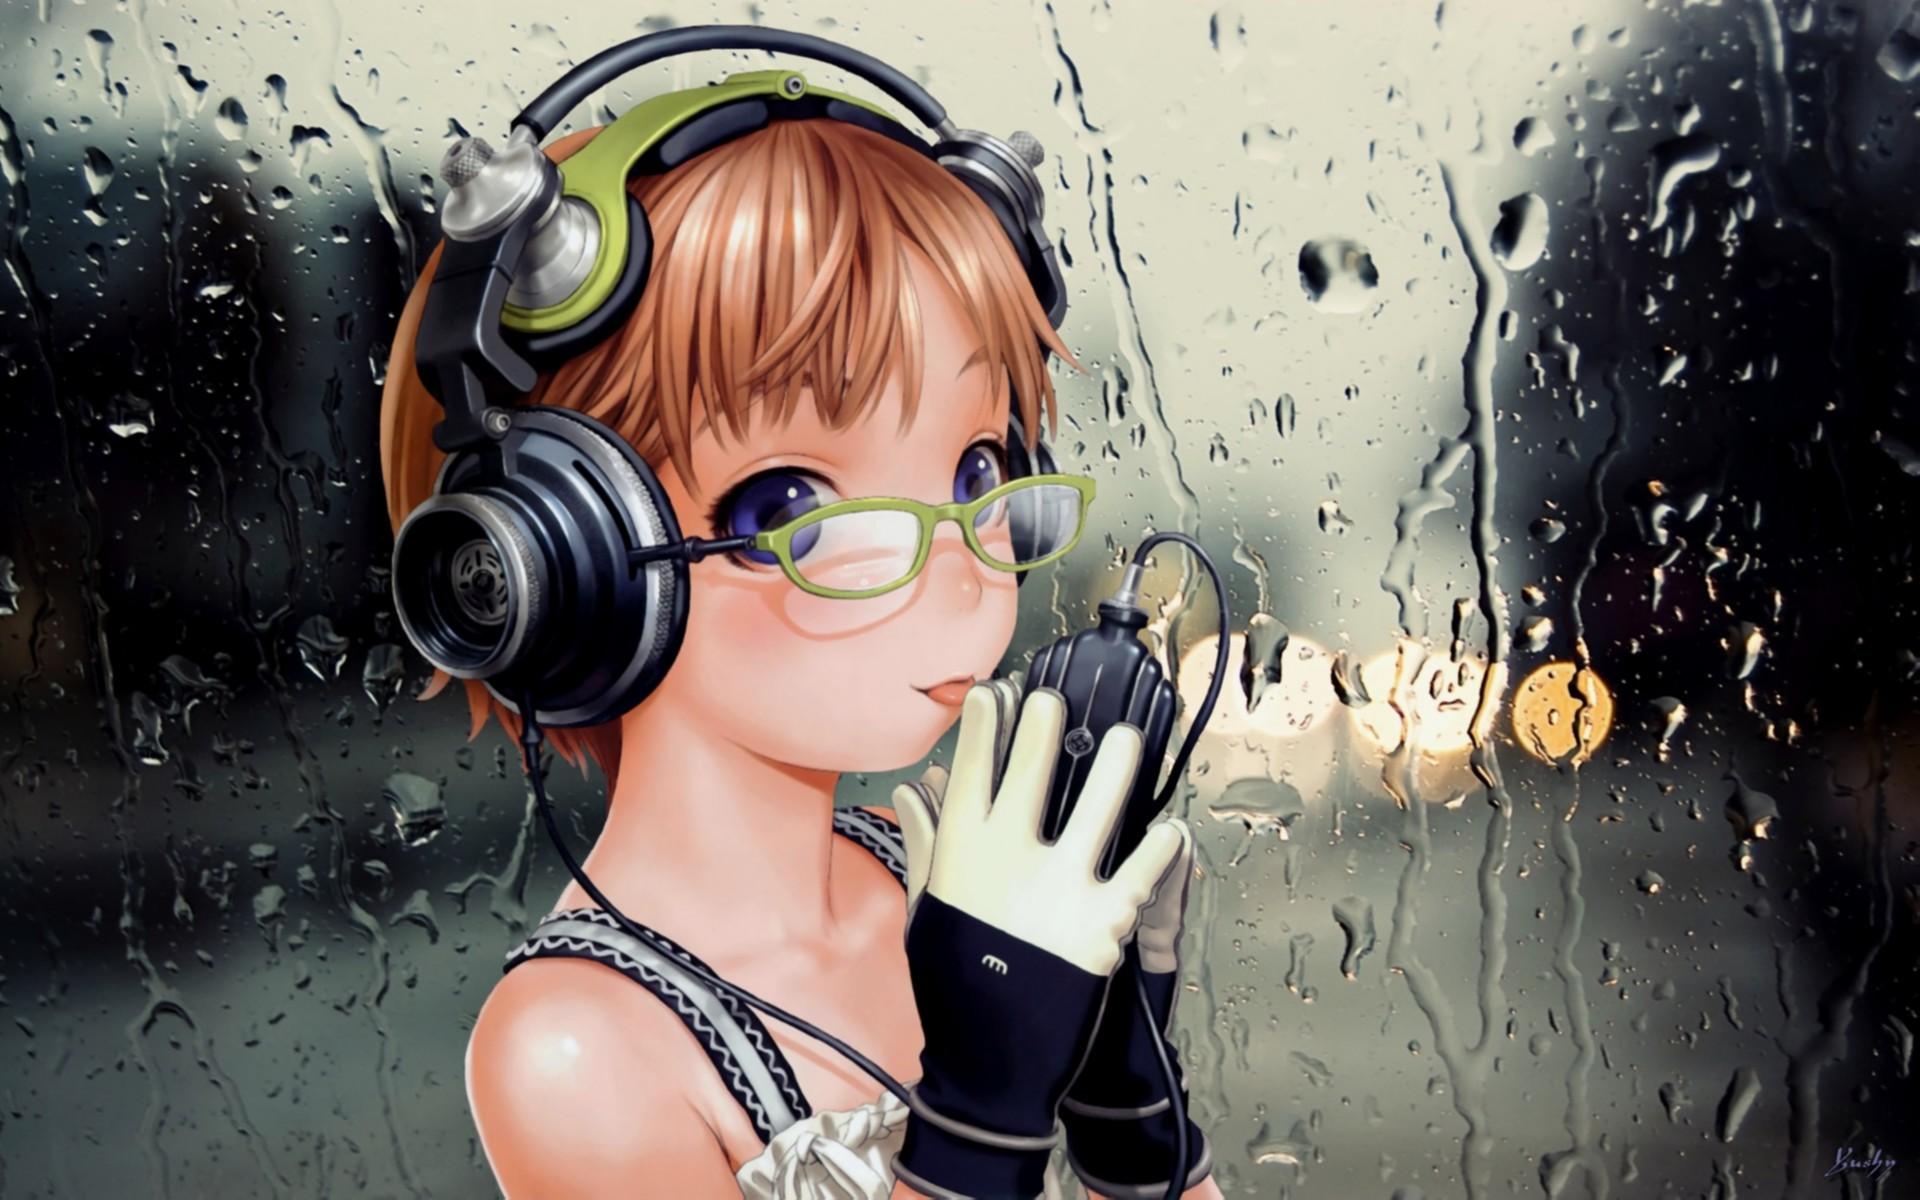 аниме девушка с микрофоном: